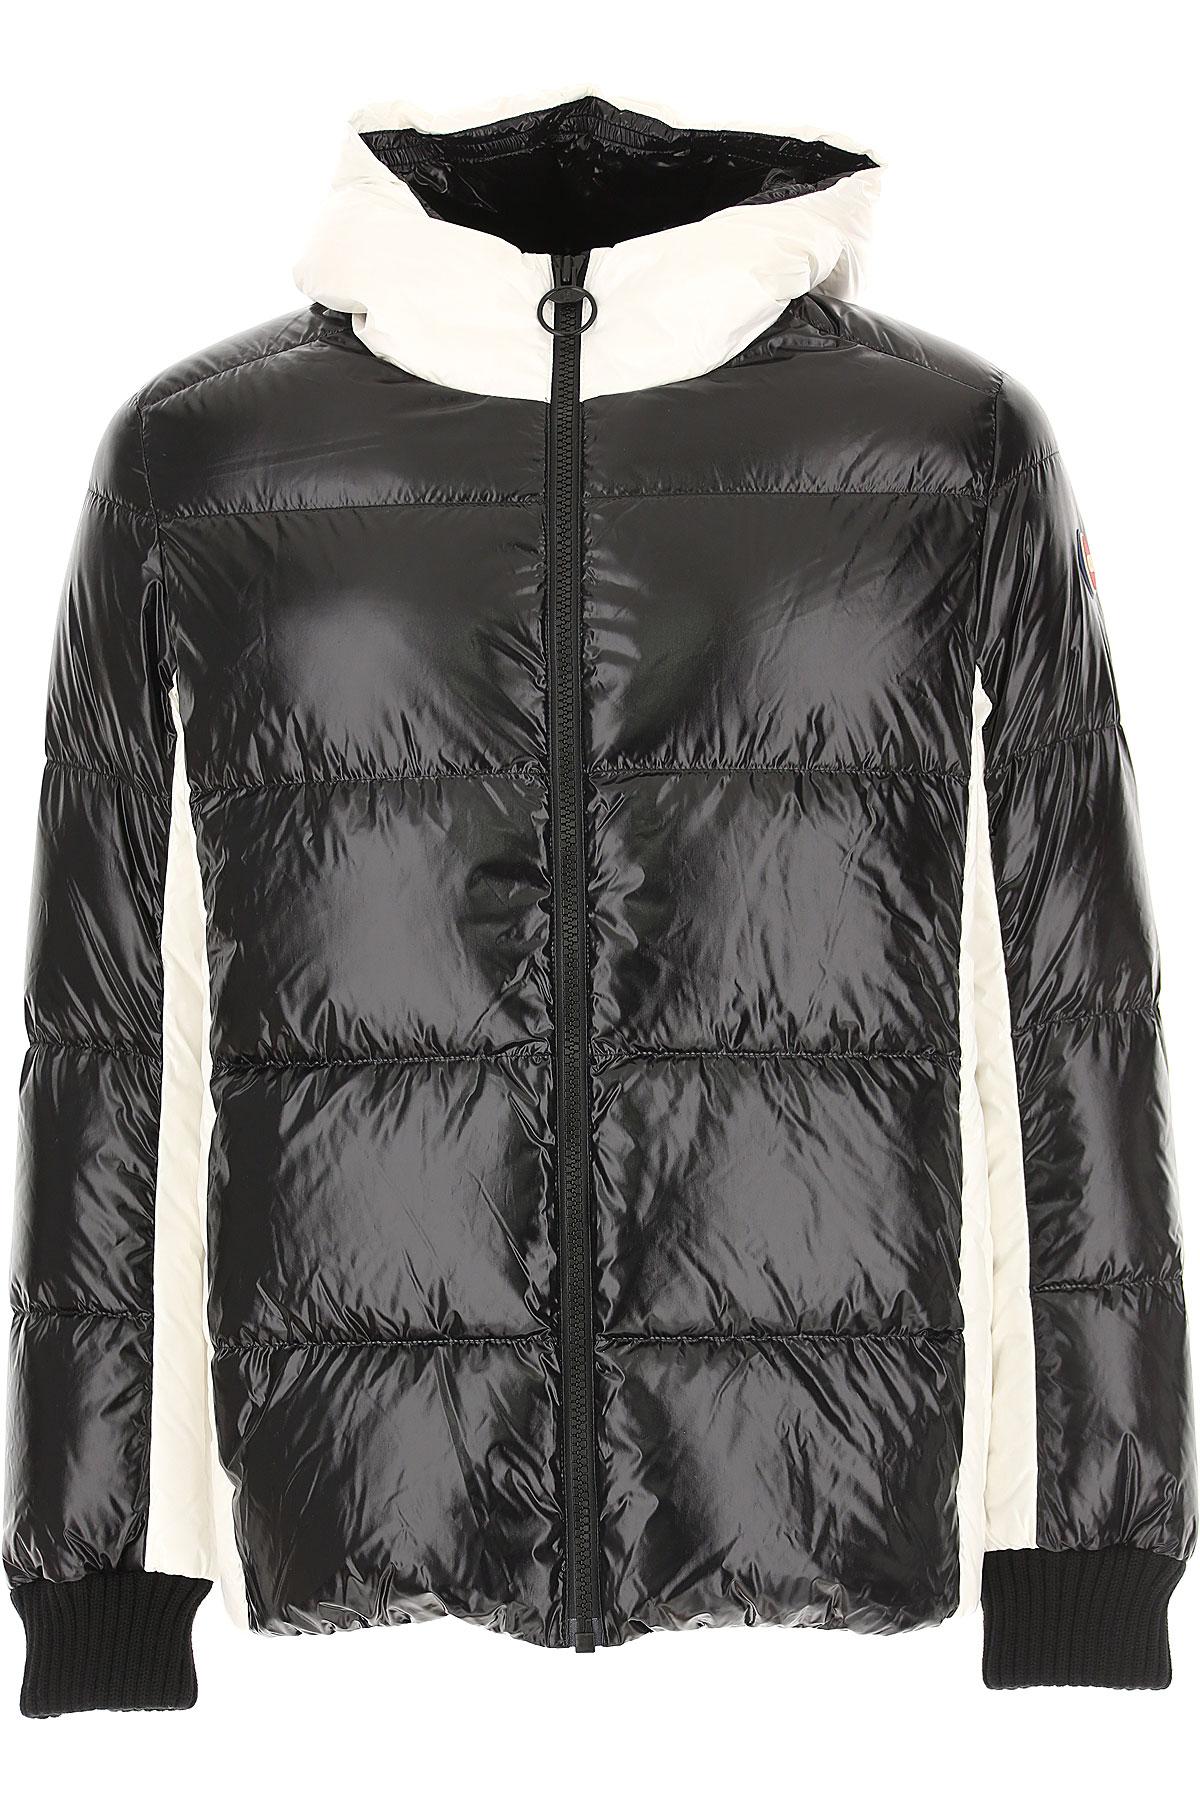 Colmar Down Jacket for Men, Puffer Ski Jacket On Sale, Black, polyester, 2019, L M S XL